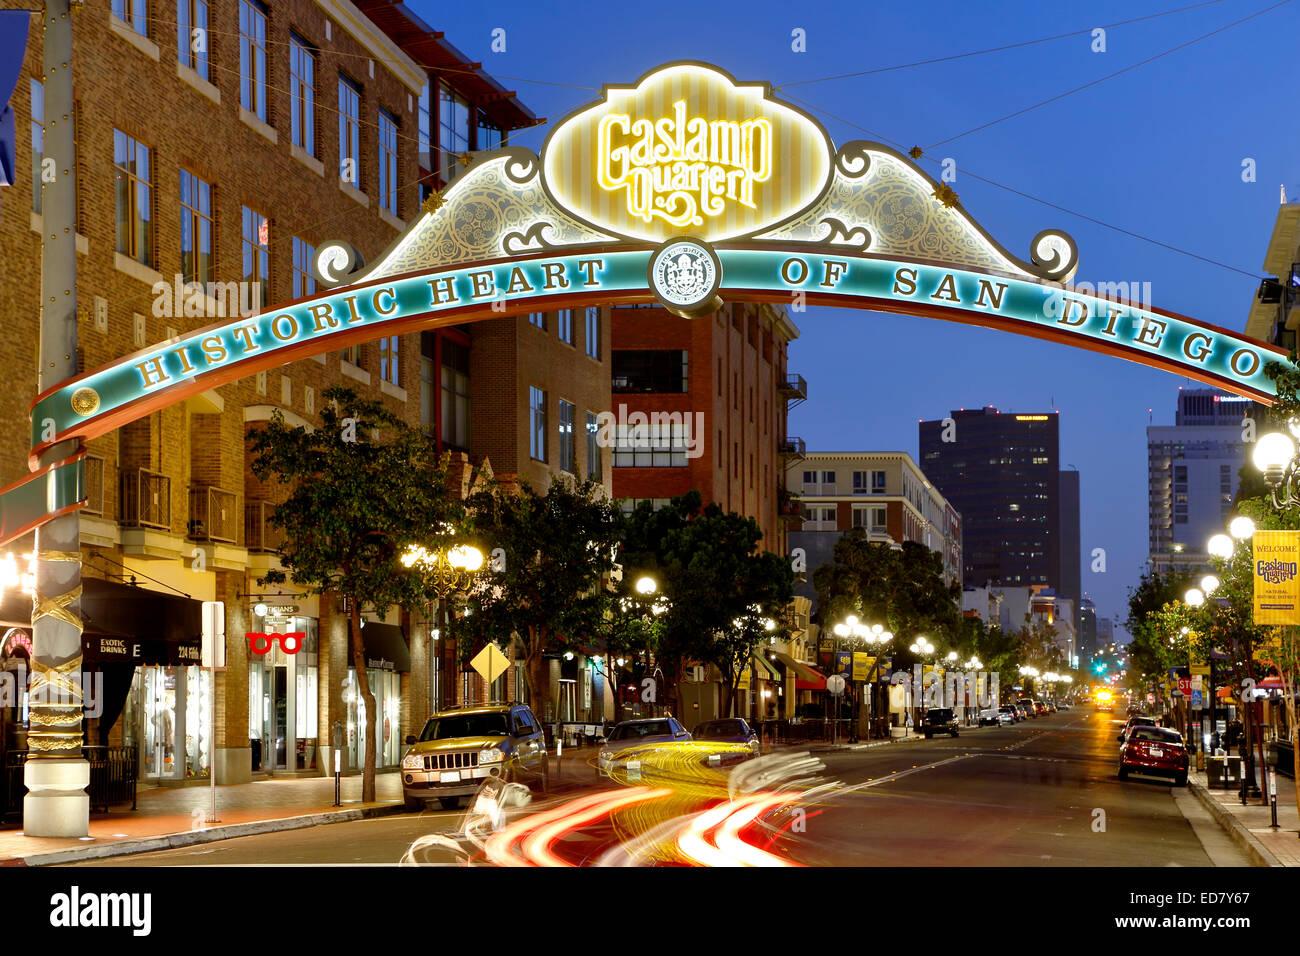 Historic Gaslamp Quarter, San Diego, California USA